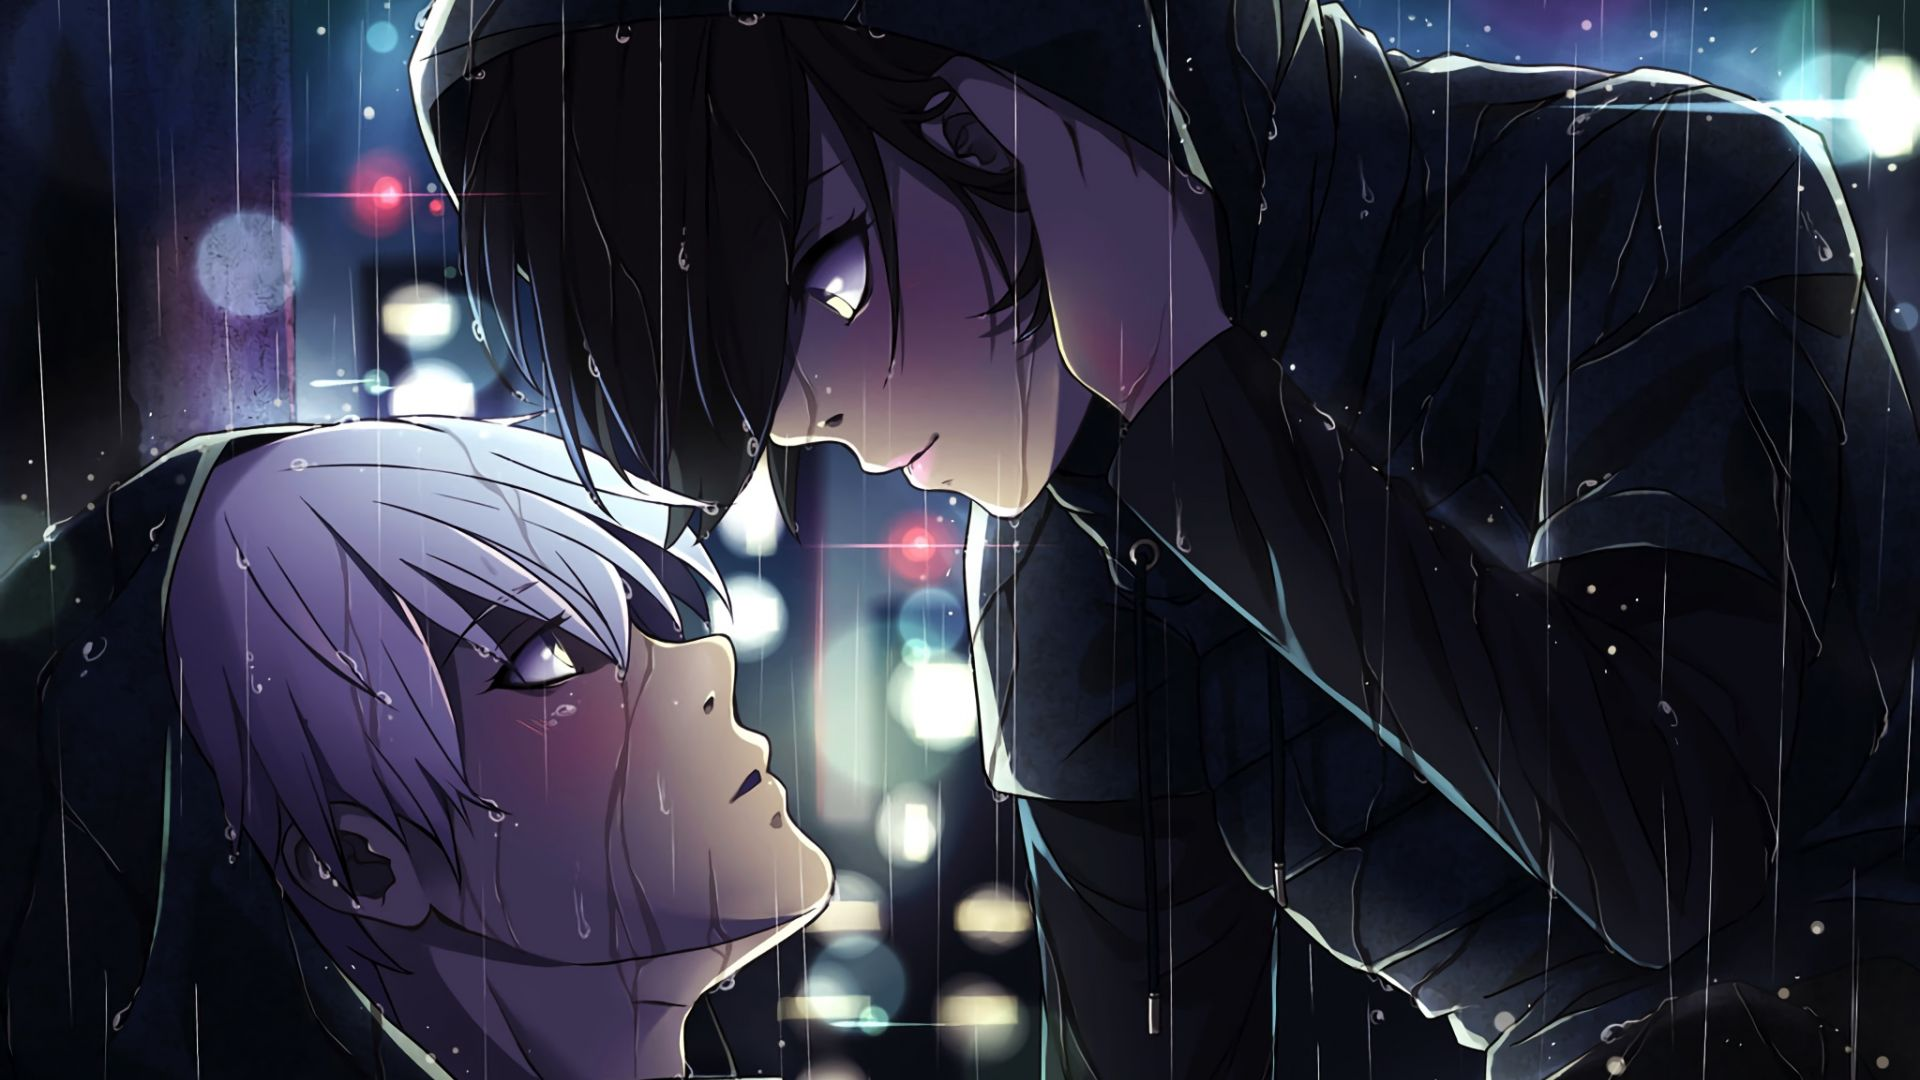 Desktop Wallpaper Ken Kaneki Touka Kirishima Anime Tokyo Ghoul Rain Hd Image Picture Background 11a70d